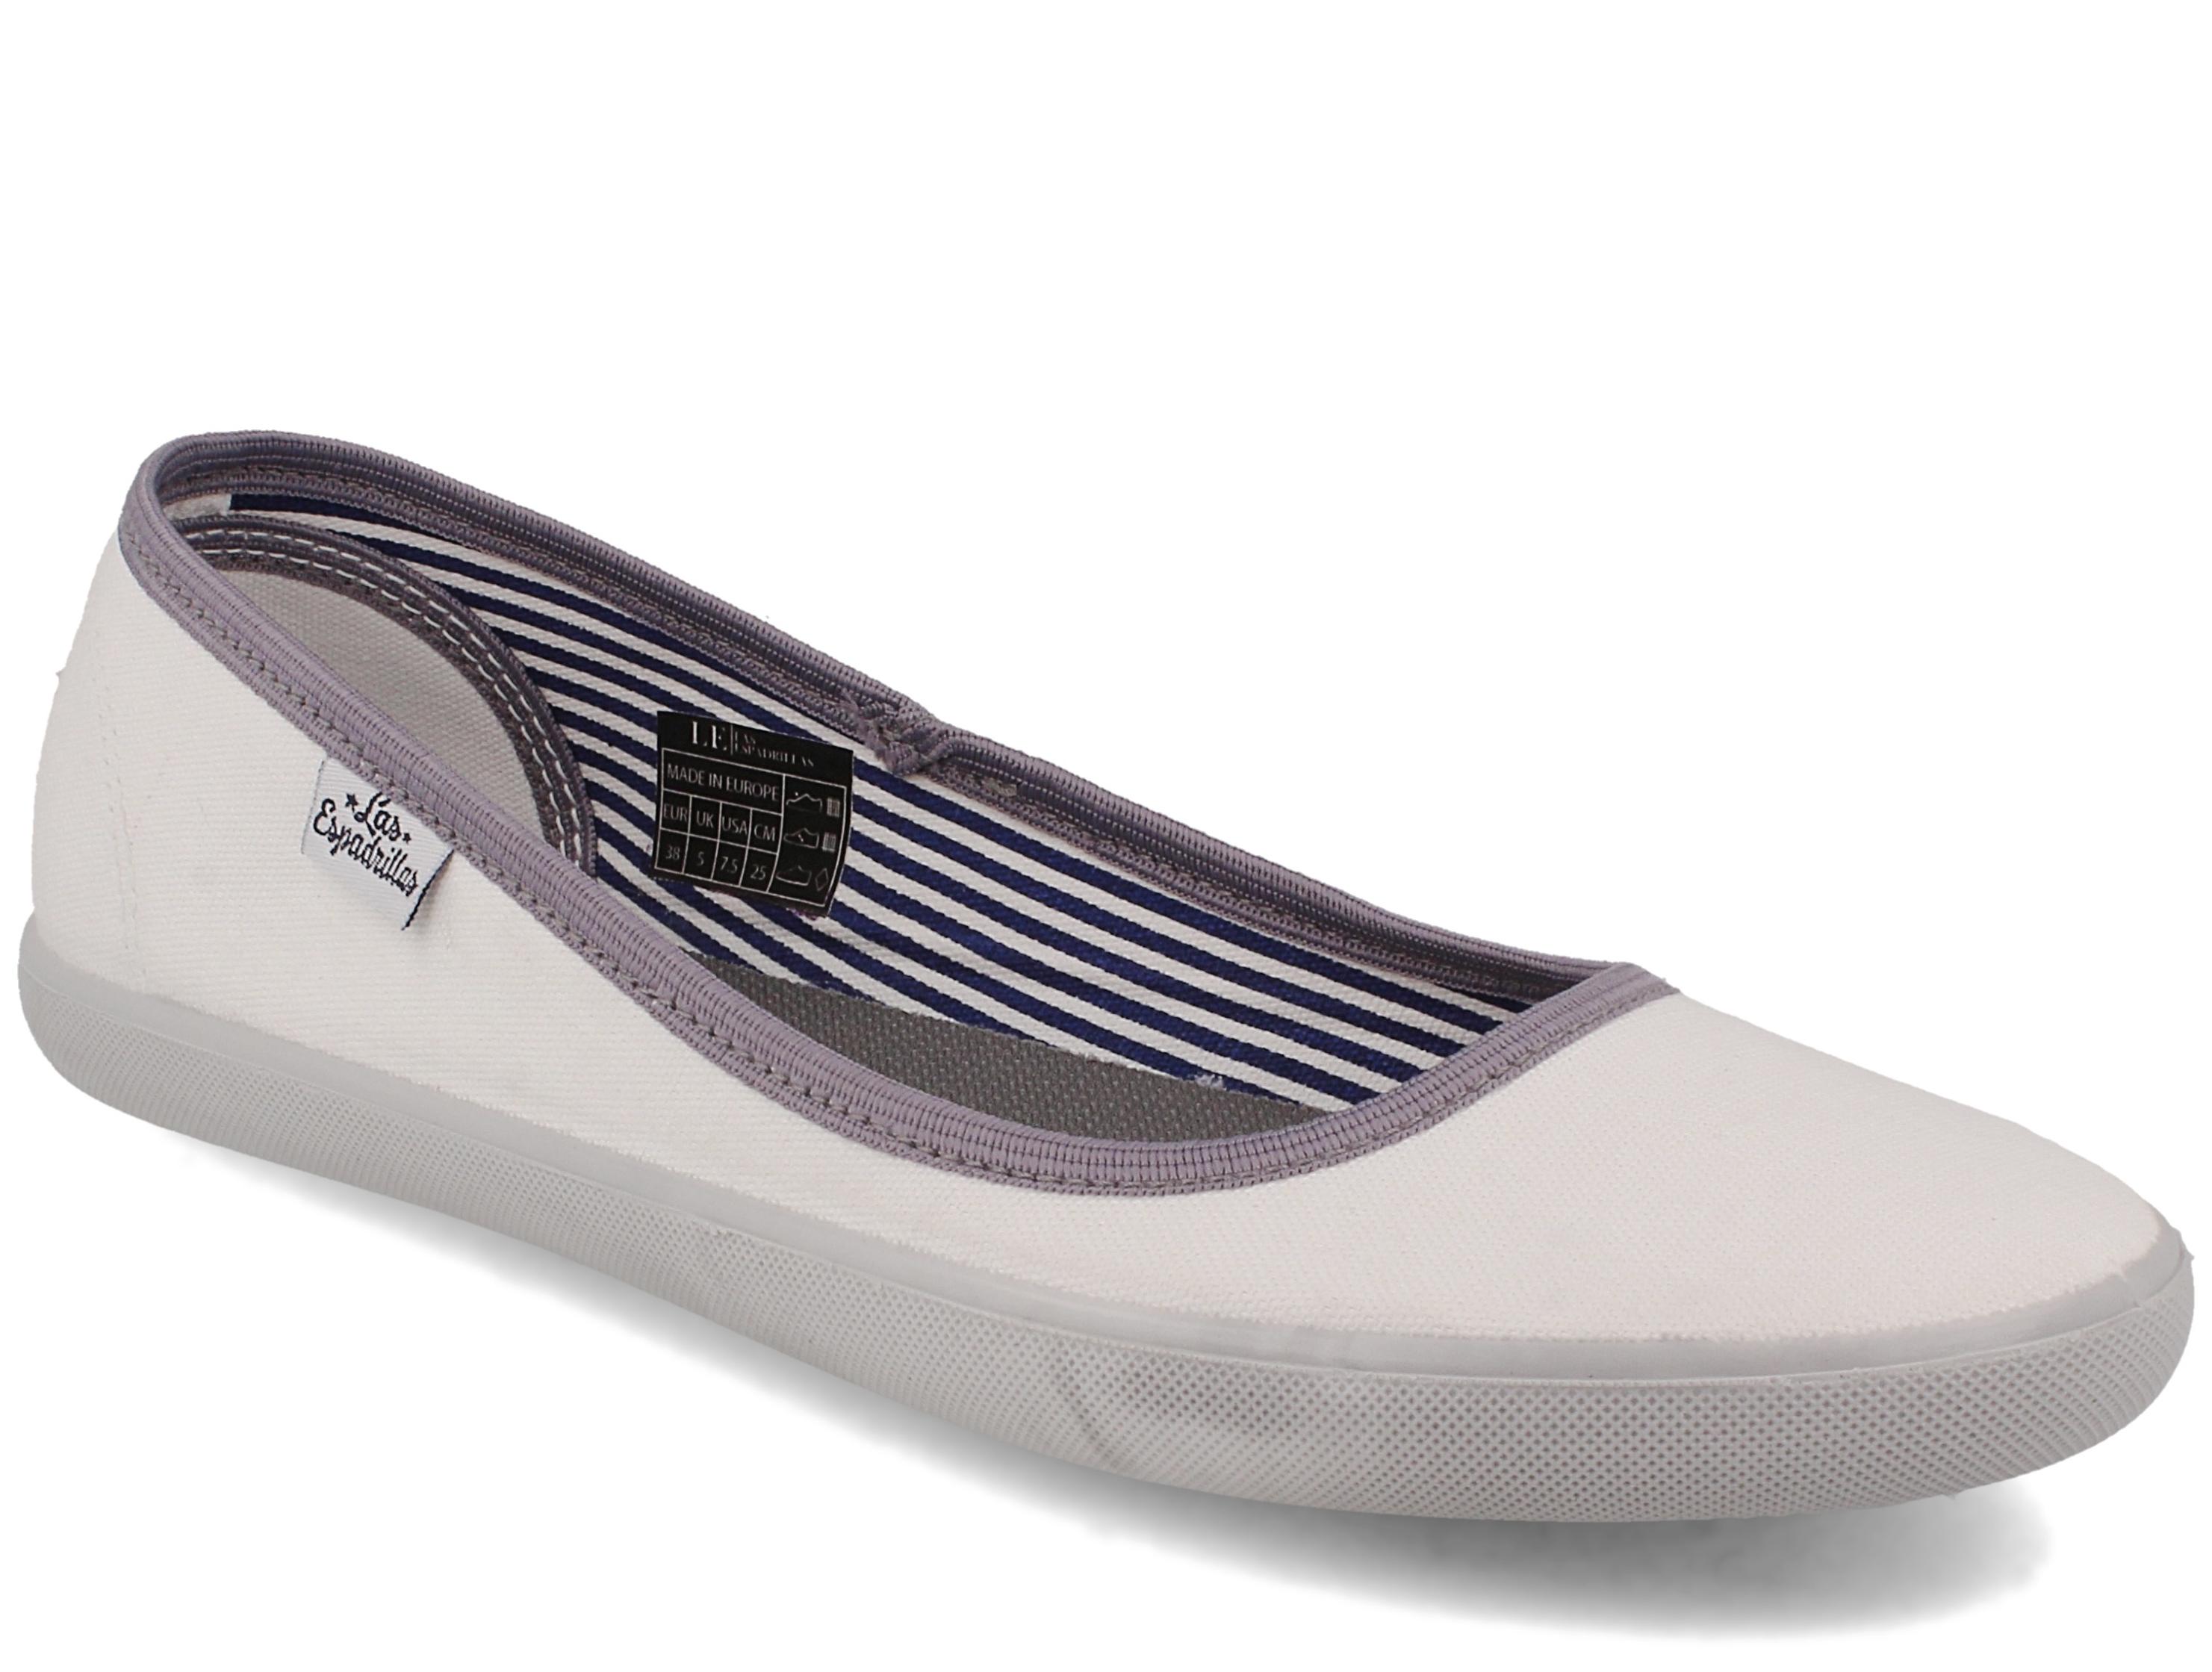 Купить со скидкой Женские балетки Las Espadrillas Eco Soft LE2203-1337 Lacoste Slim White